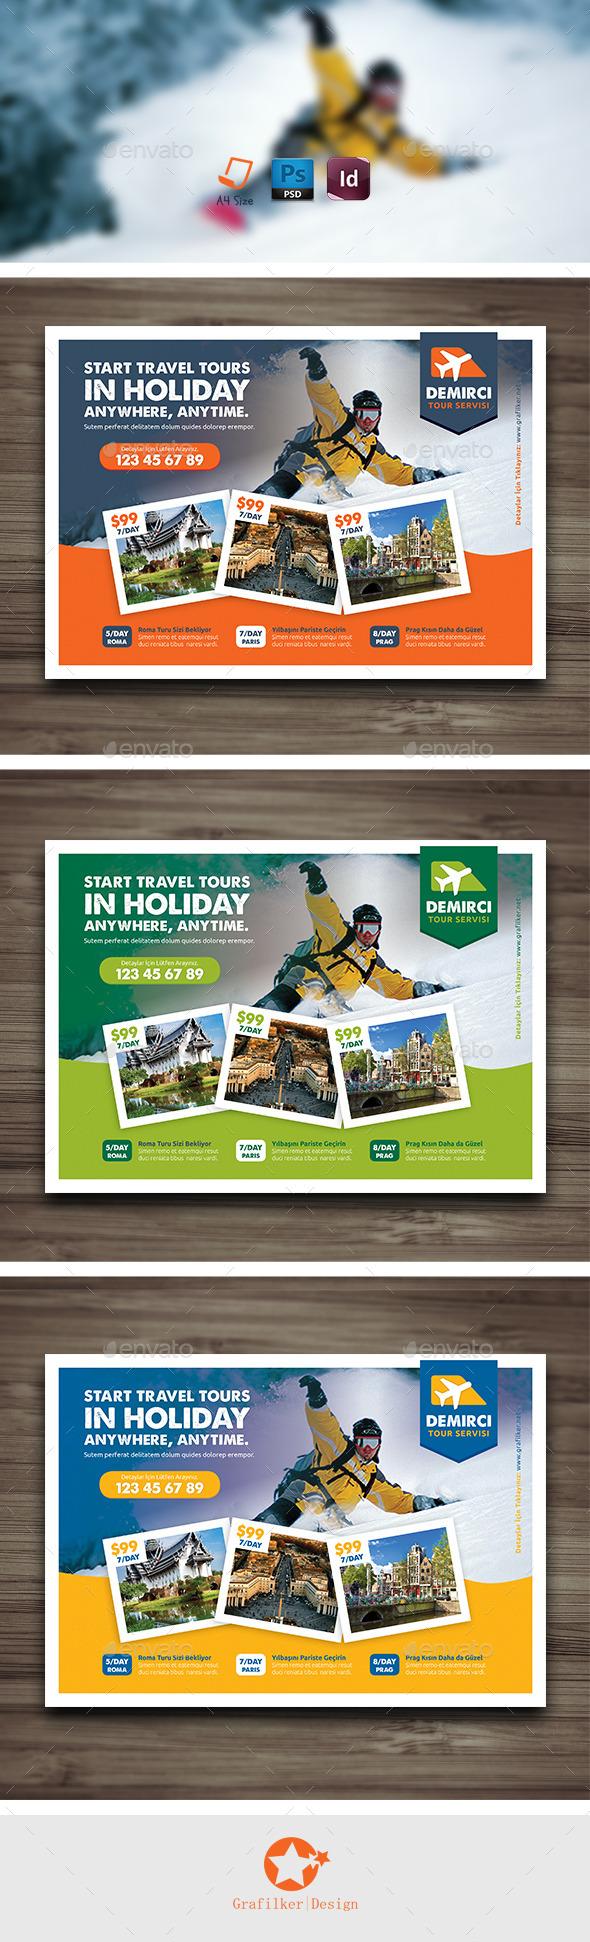 GraphicRiver Travel Tours Flyer Templates 9823574